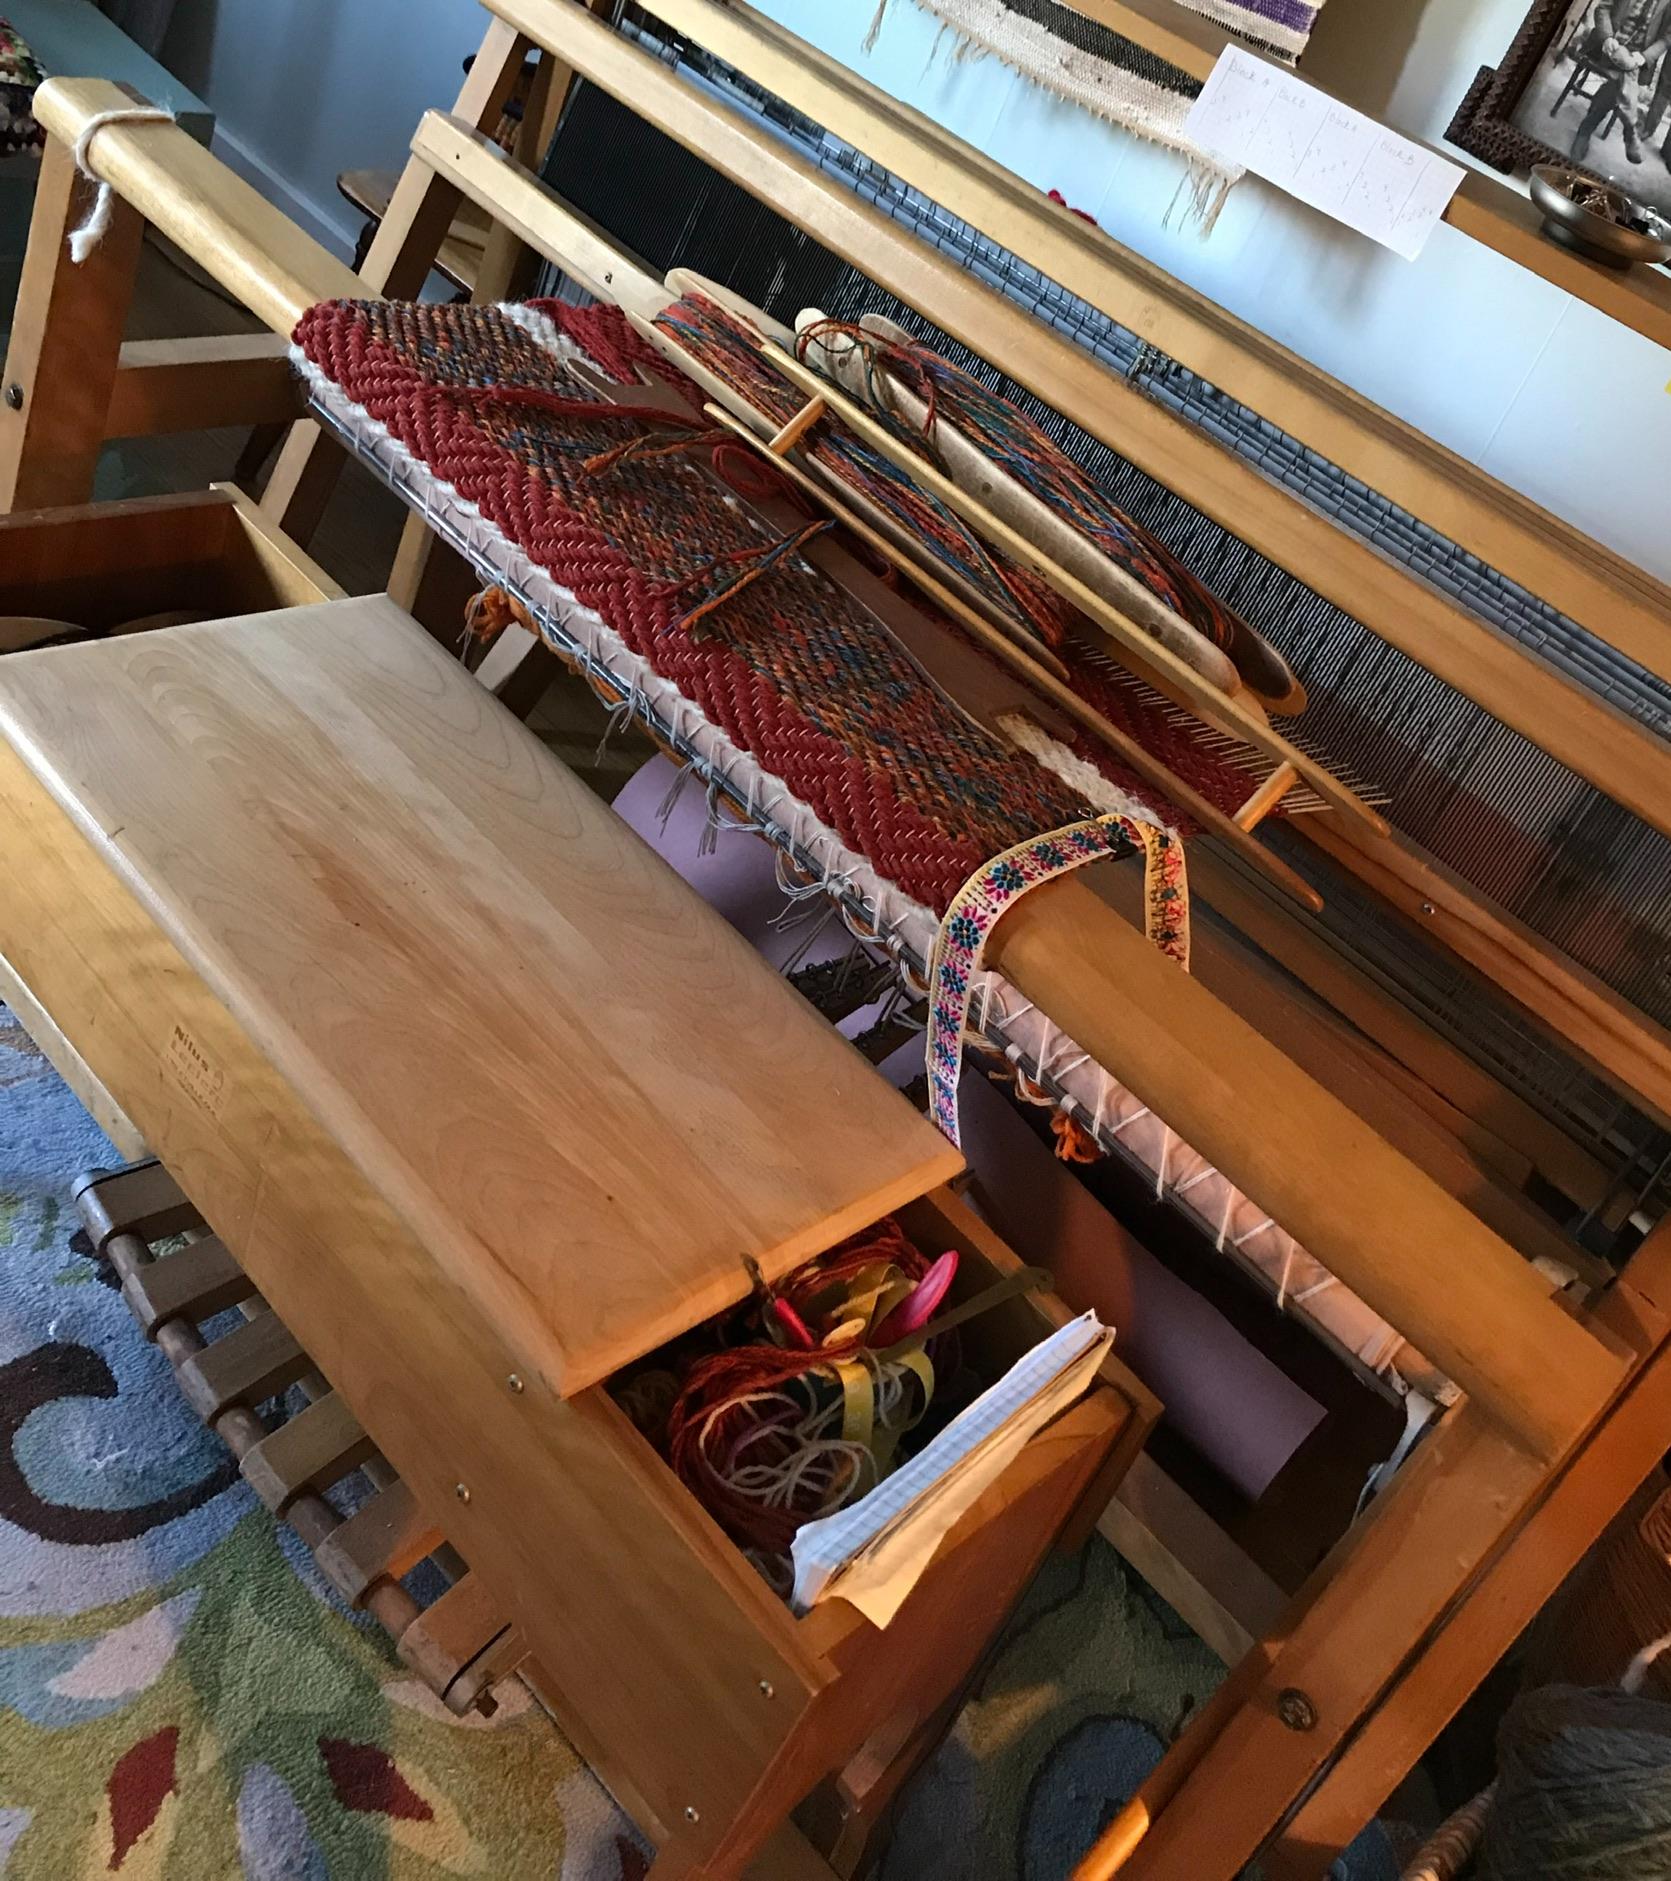 Weaving on a Floor Loom - Instructor: Zwitsa Kachinski of Meraki HandwovenDate: Friday, Sept. 6, (9:00-5:00) (Full Day Class)Cost: $140Maximum 4 spotsNo Experience Needed.